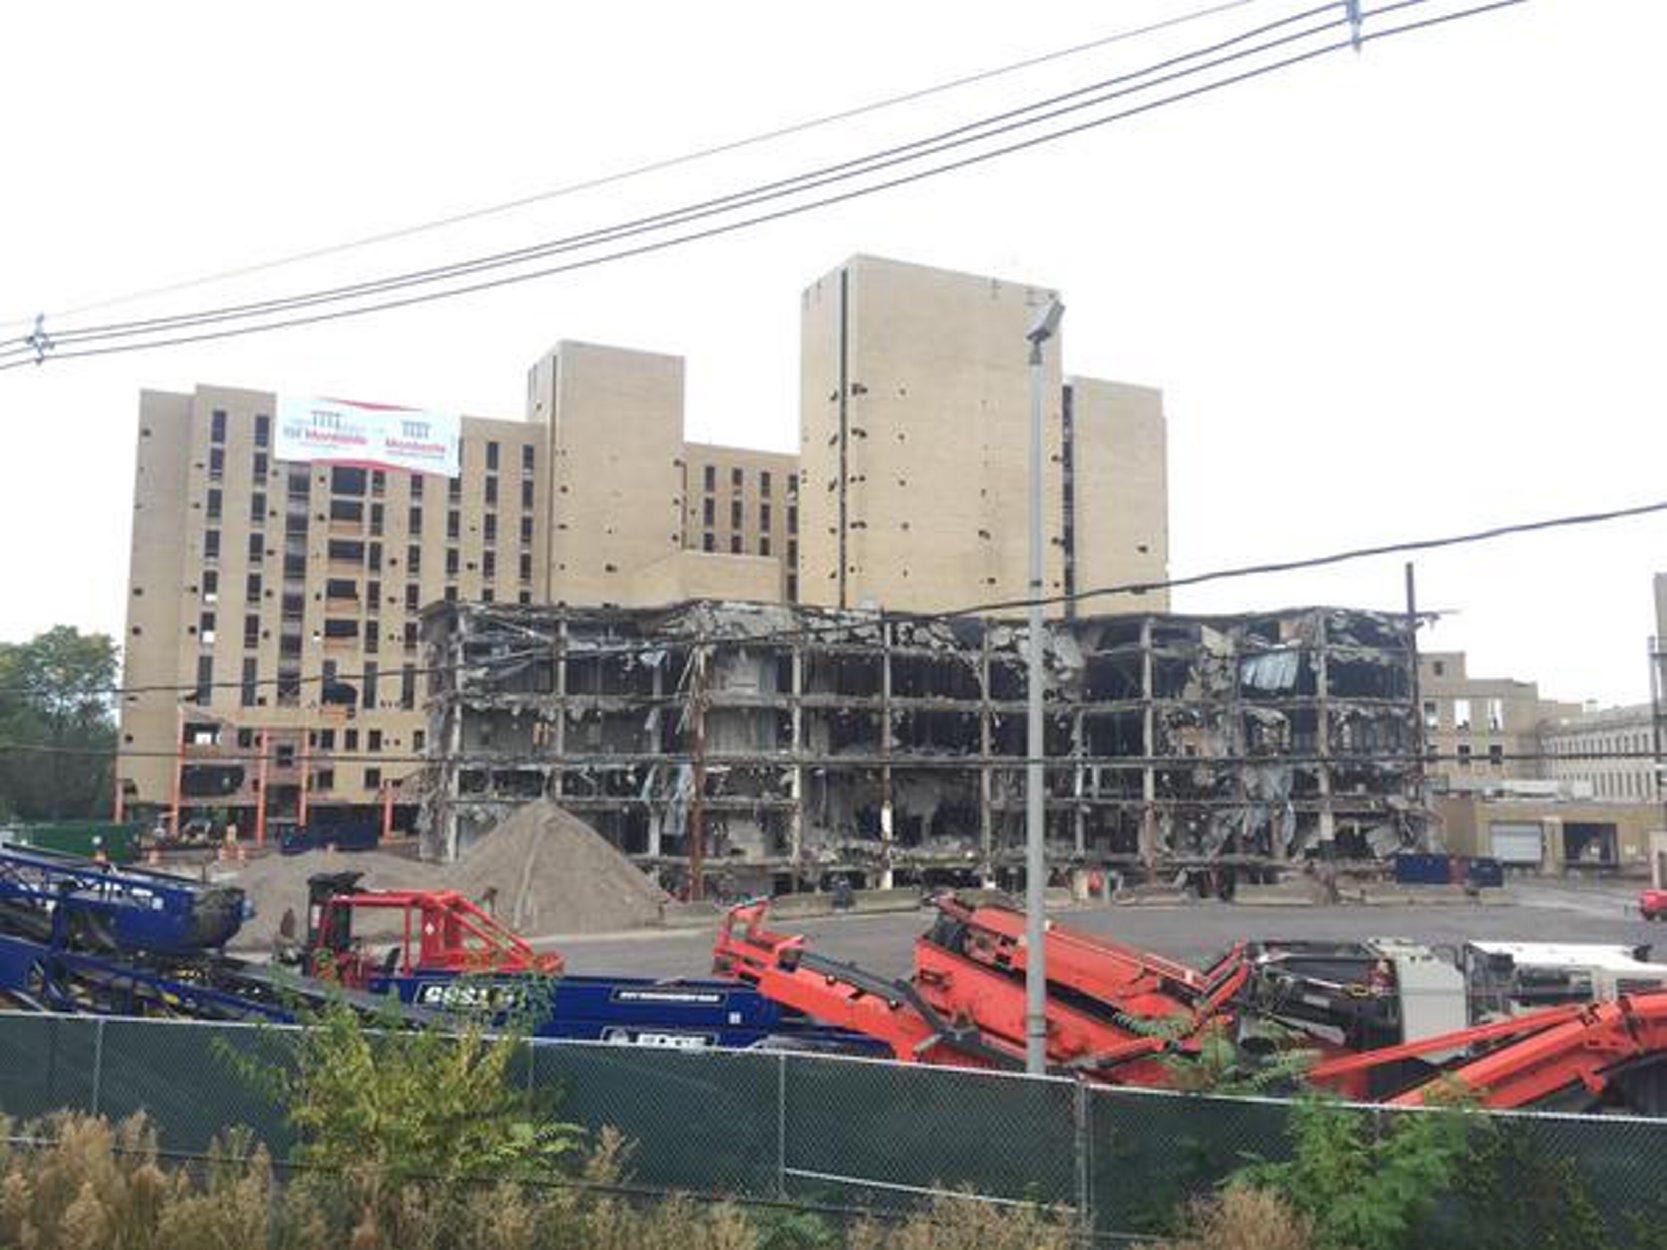 The former Millard Fillmore Hospital as seen Sept. 29, 2015. (Mark Mulville/Buffalo News)